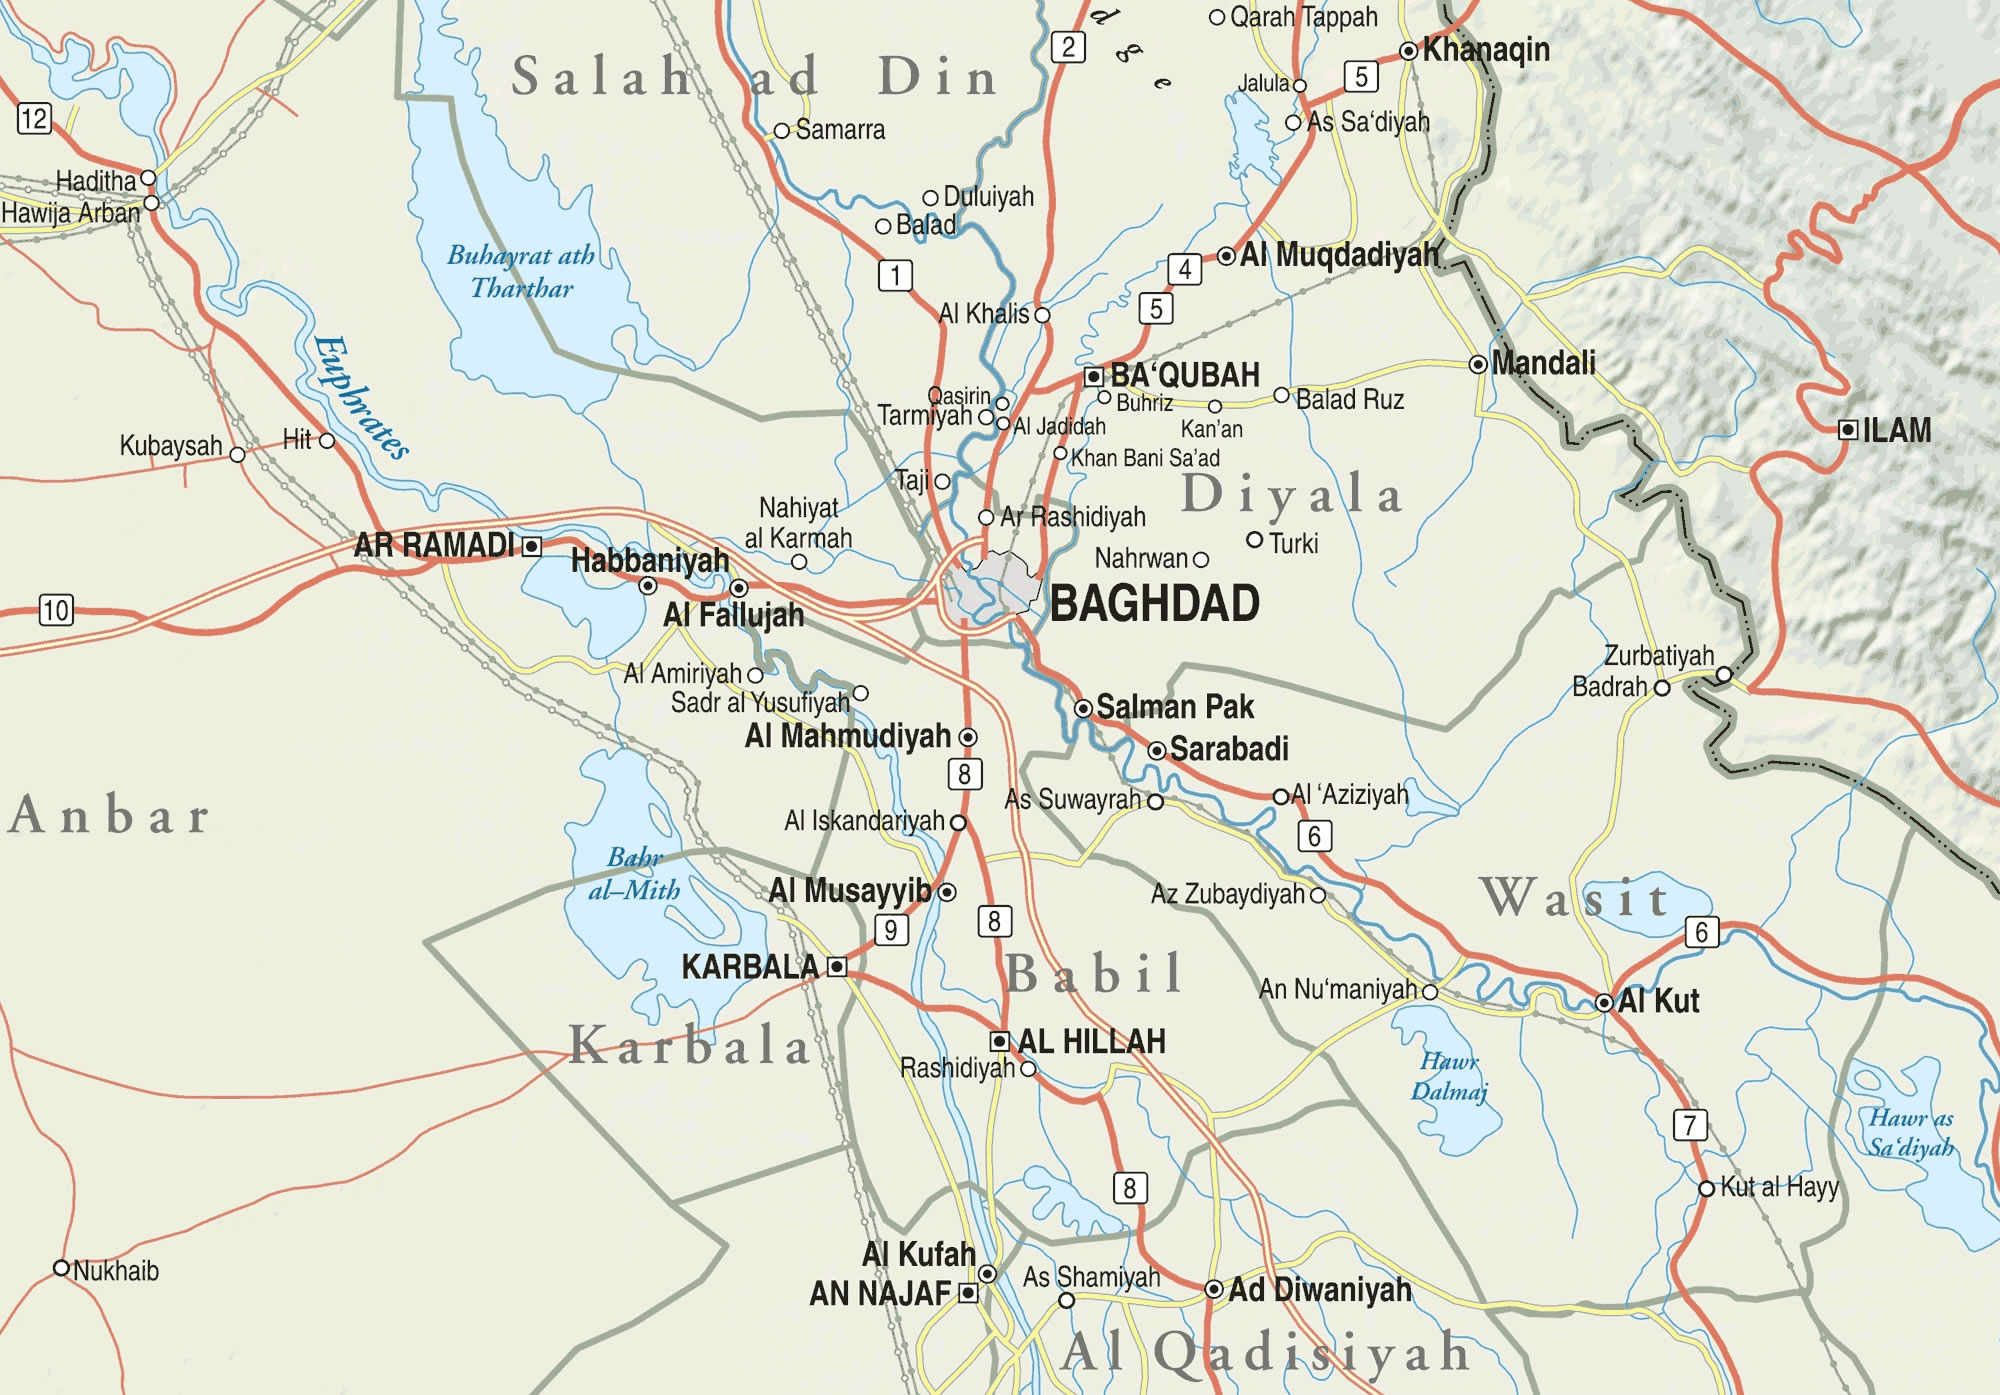 Carte routière Irak, Carte routière de Irak